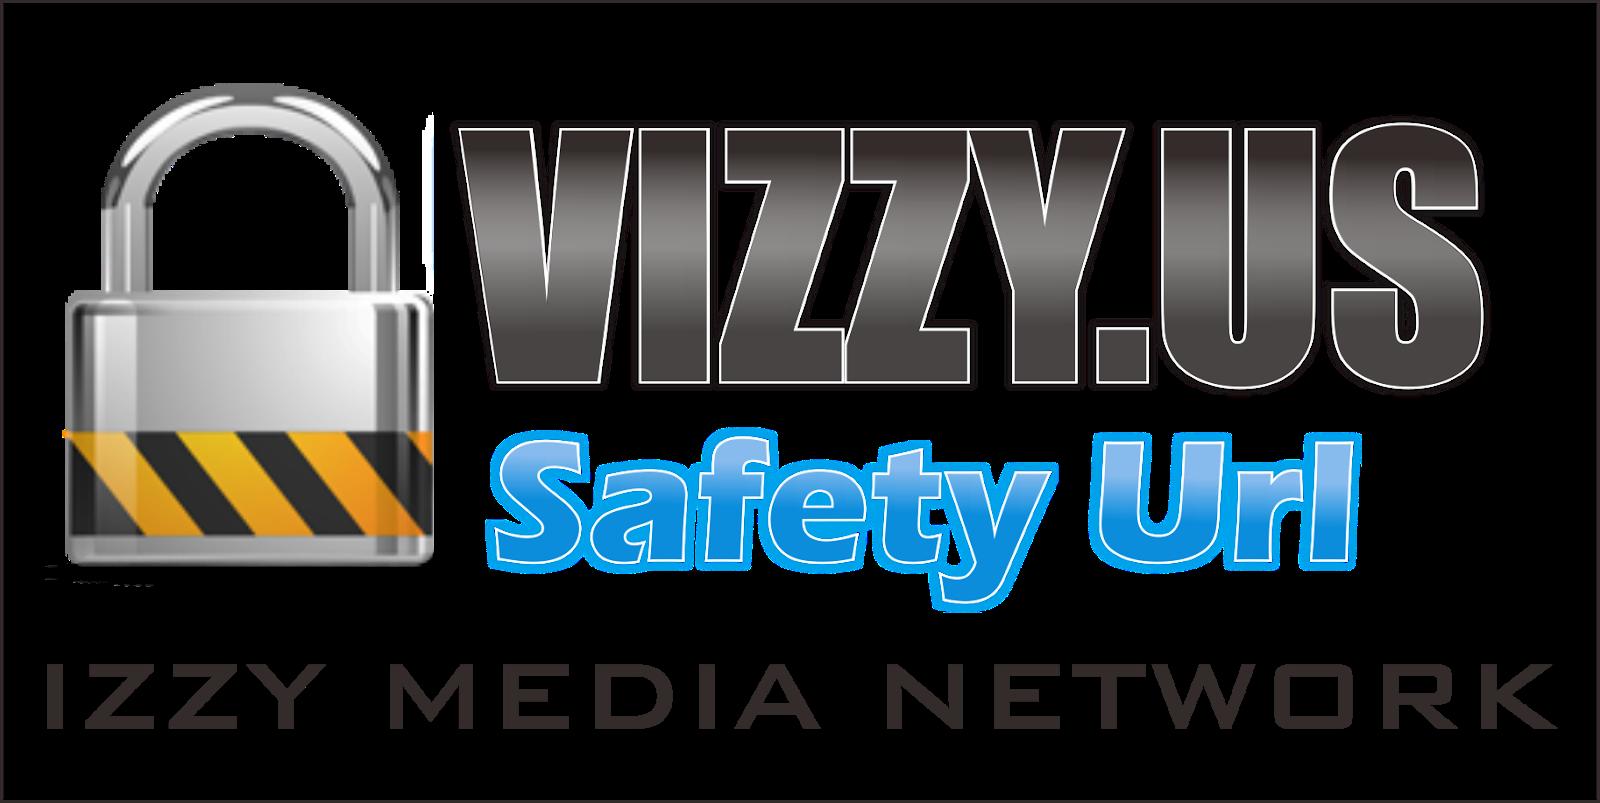 Cara Mendaftar Di vizzy.us (Safety Url)